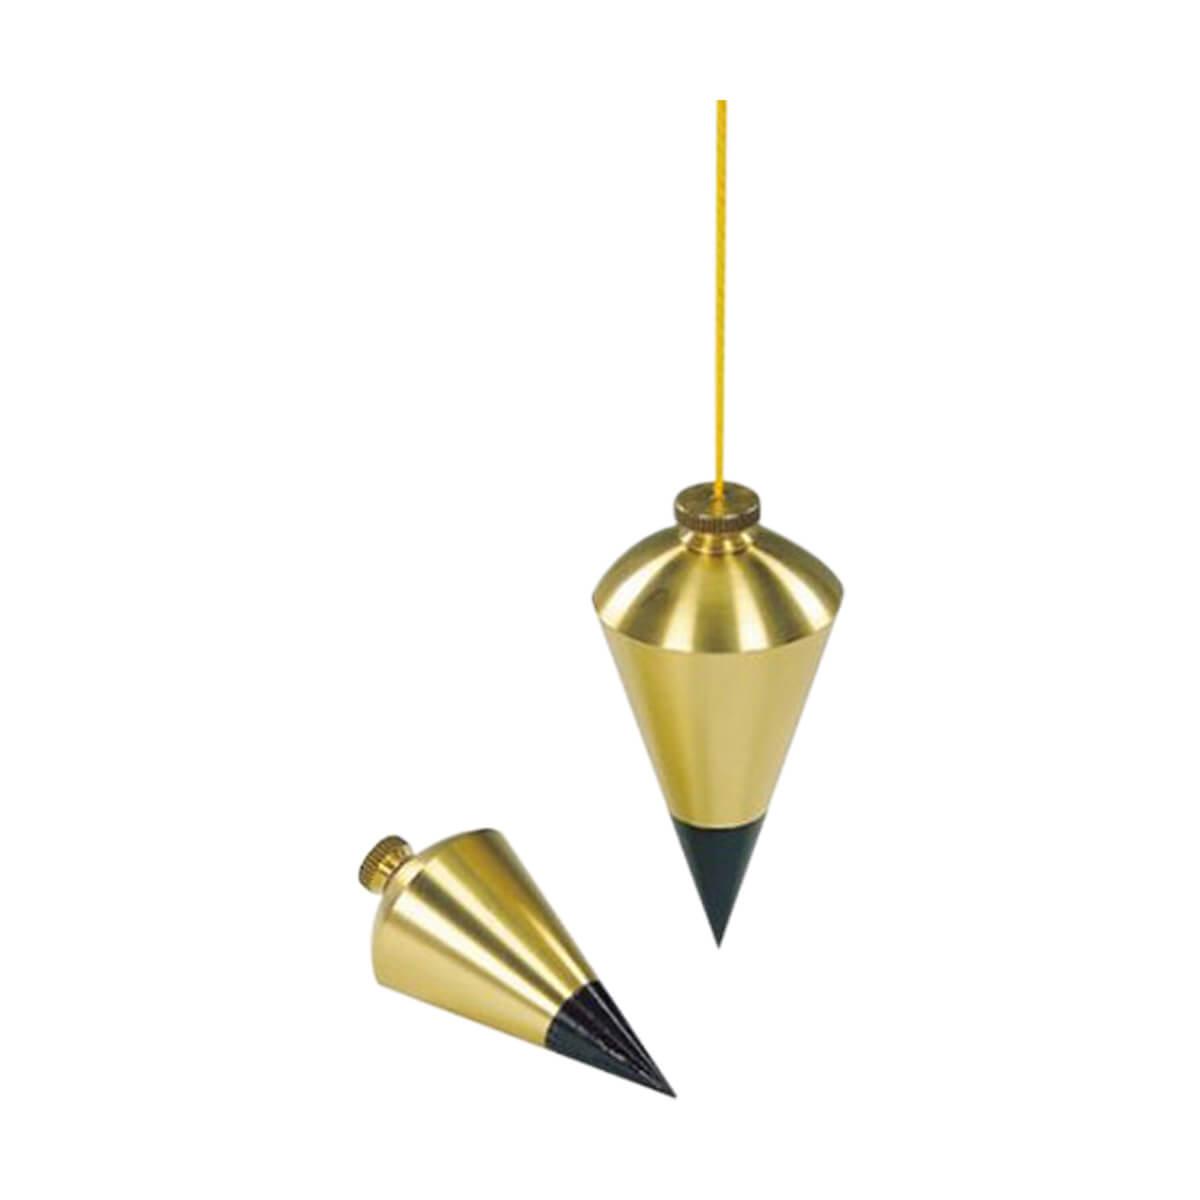 Stanley 8oz. Brass Plumb Bob - 47-973